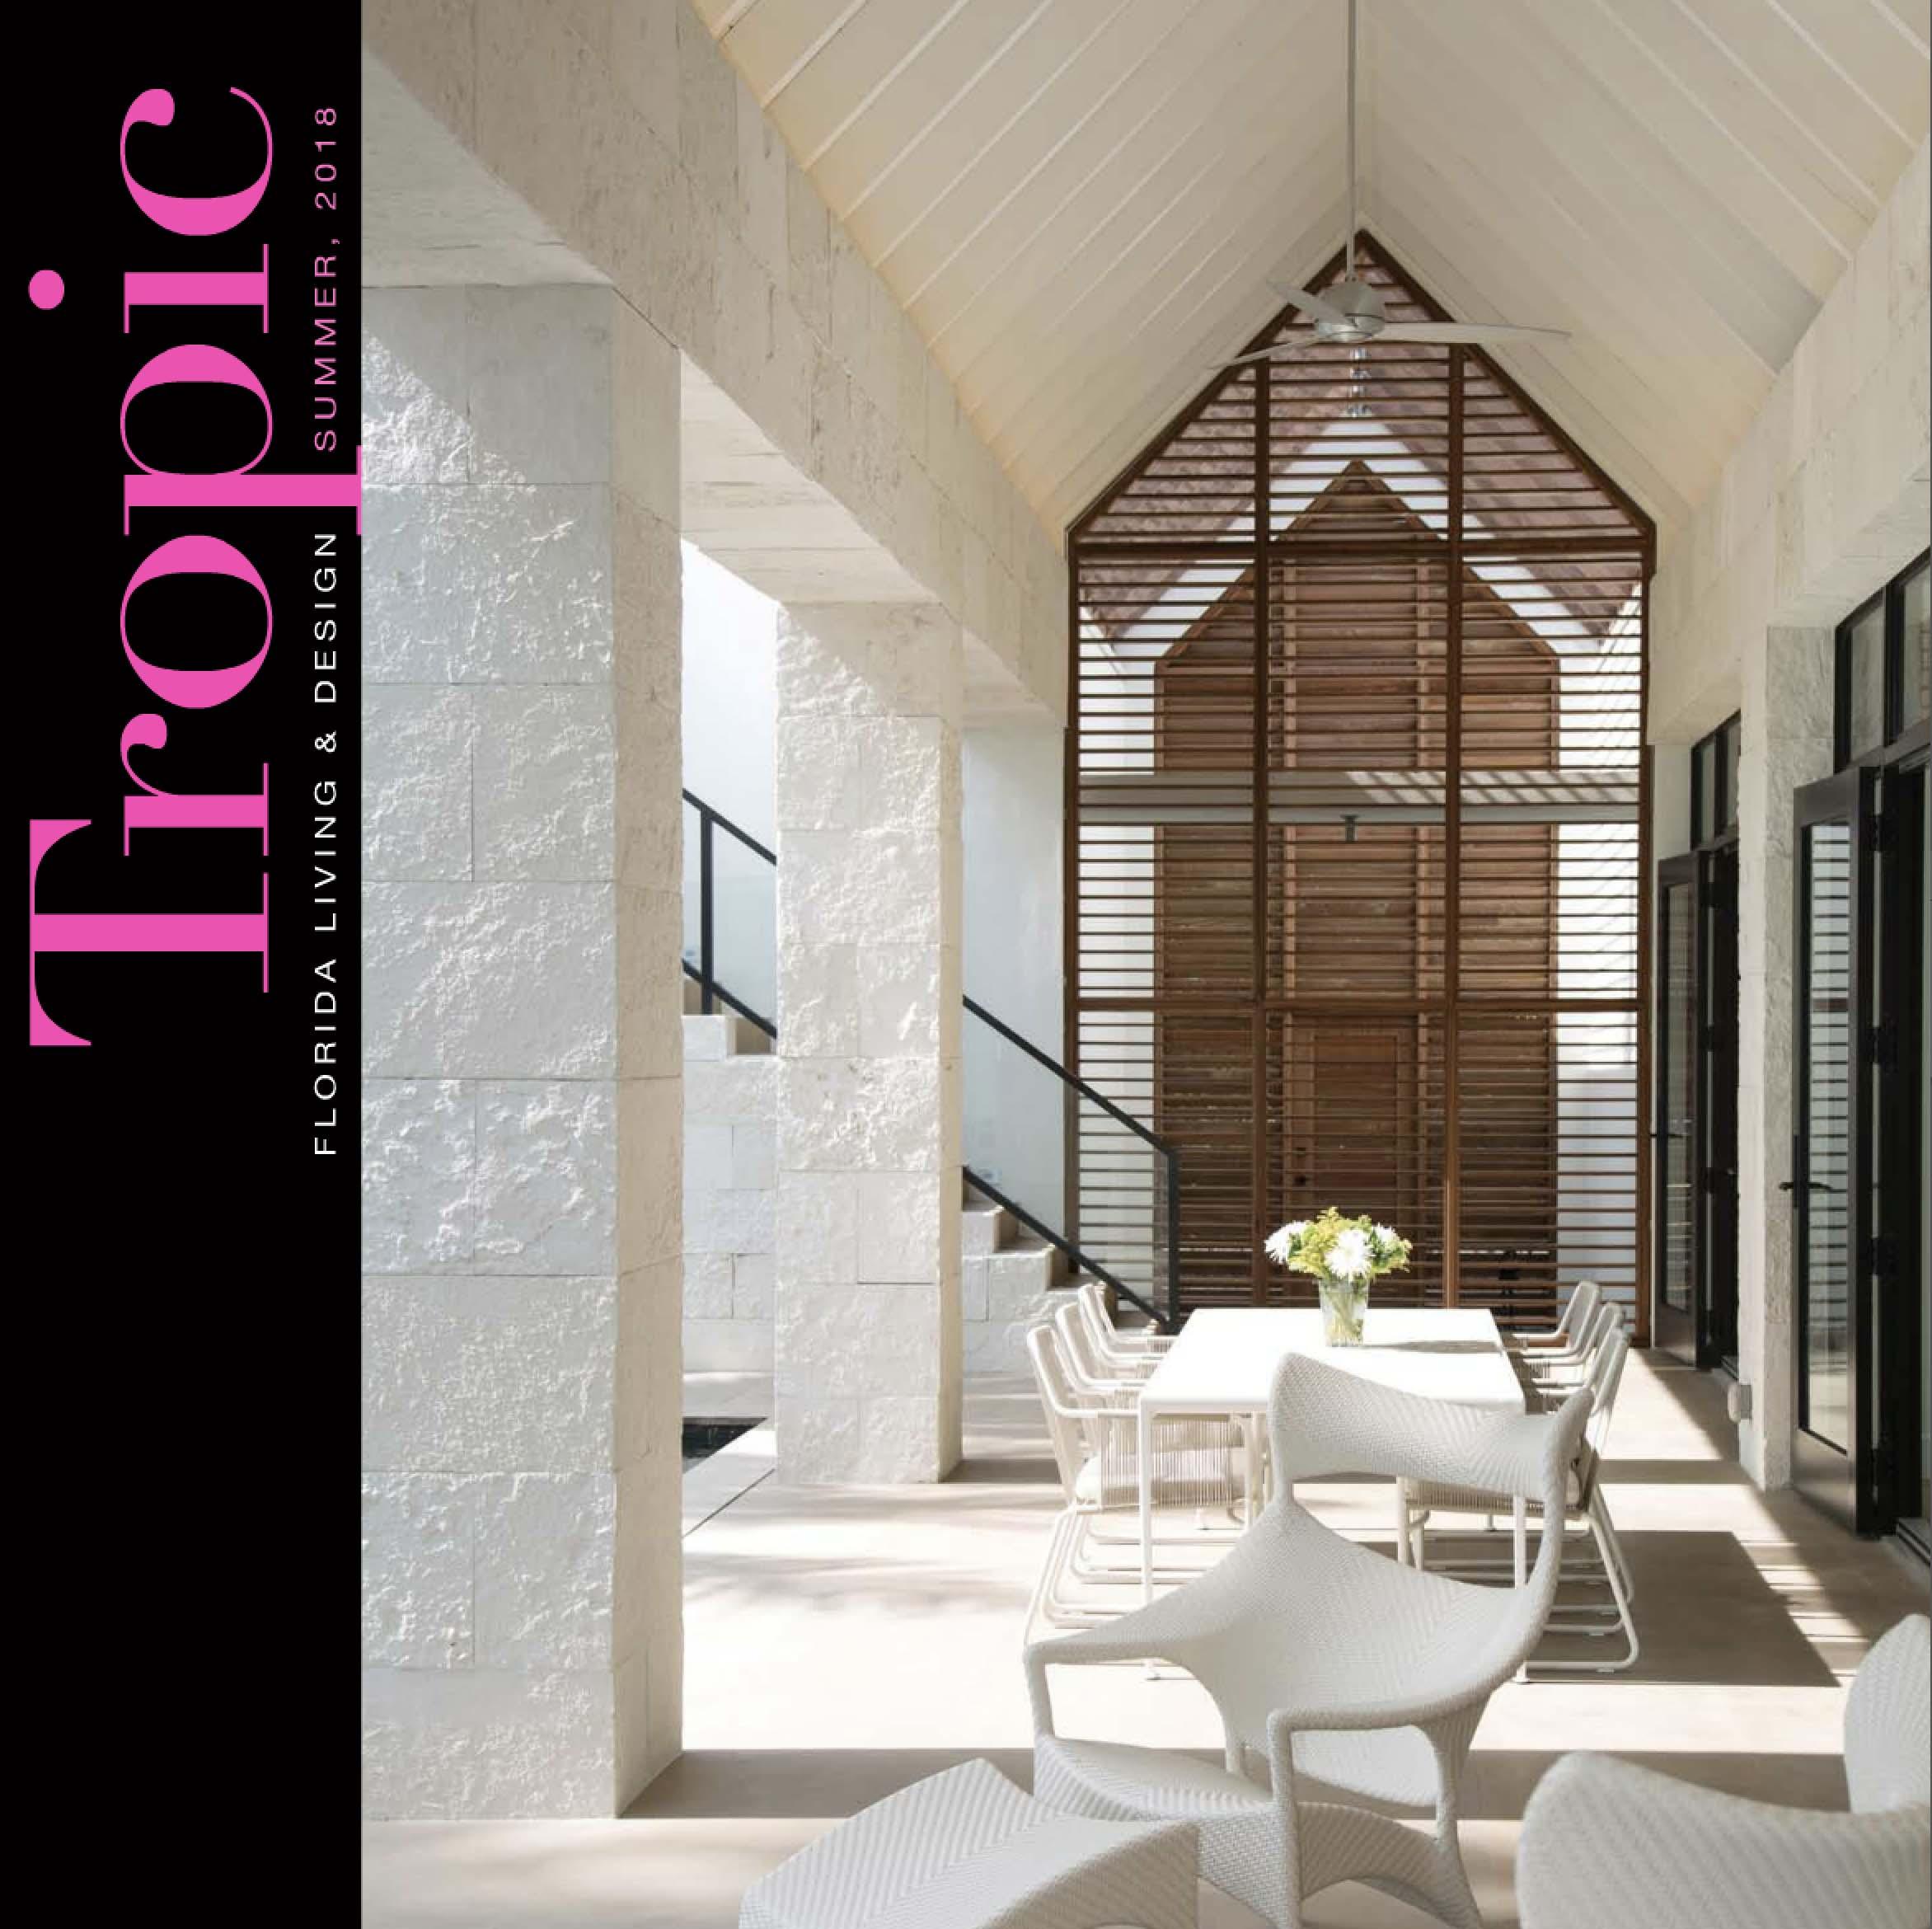 Tropic_Cover.jpg